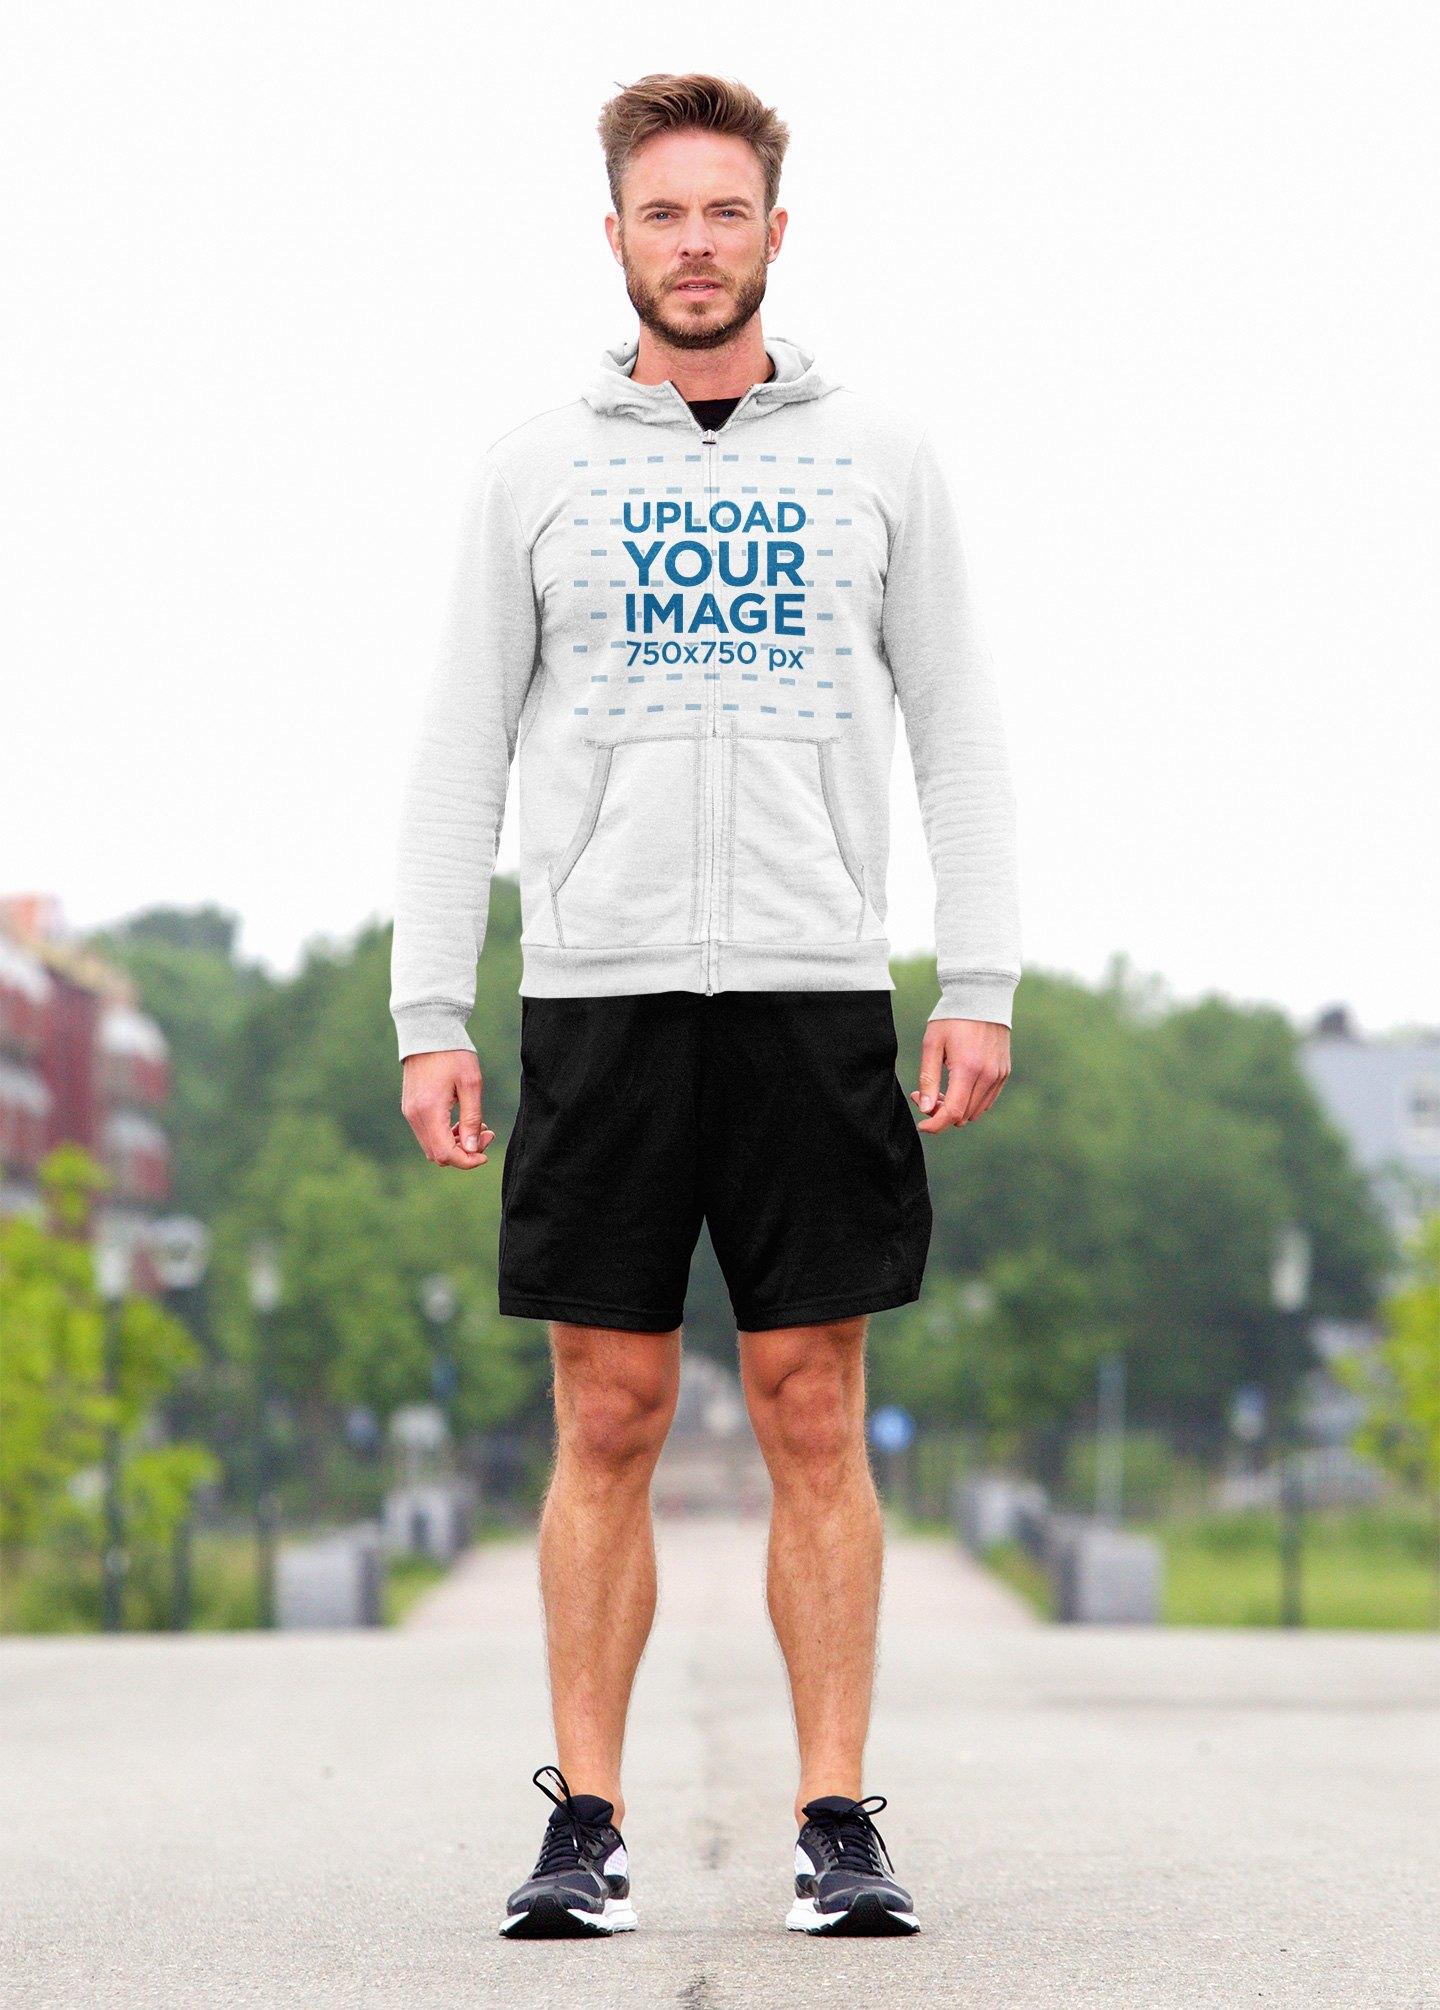 Full-Zip Hoodie Mockup Featuring a Man Ready to Jog 39996-r-el2